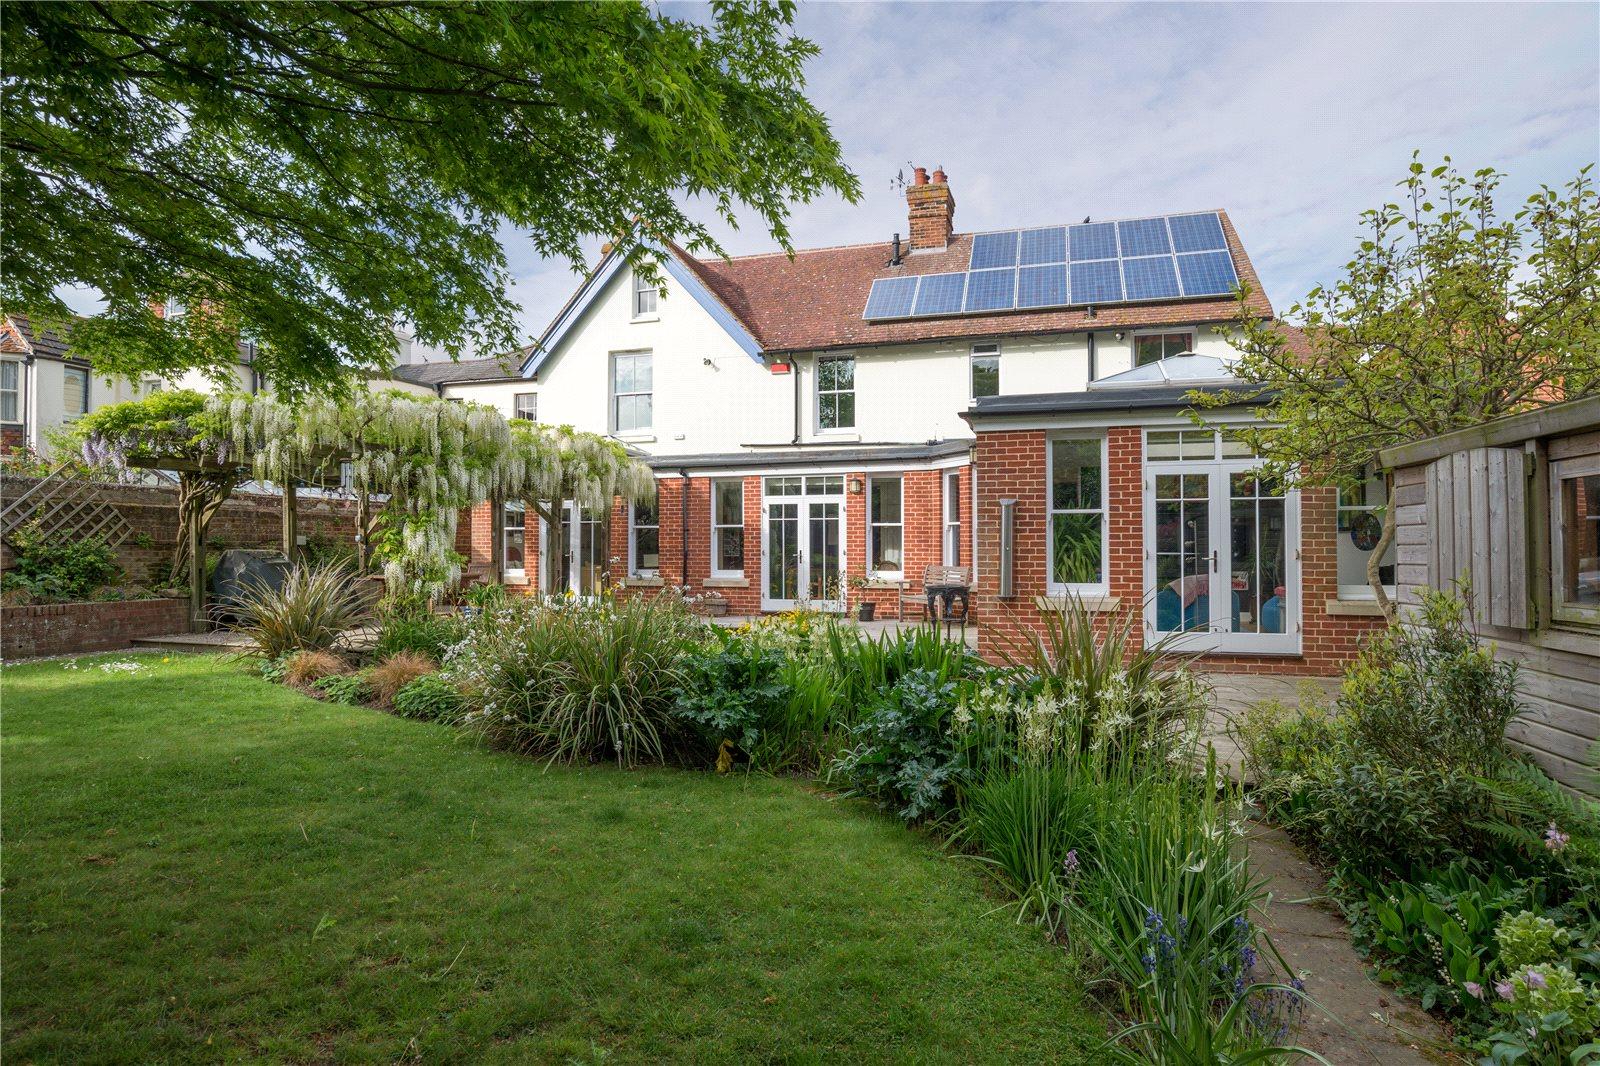 Tek Ailelik Ev için Satış at Whitstable Road, Canterbury, Kent, CT2 Canterbury, Ingiltere